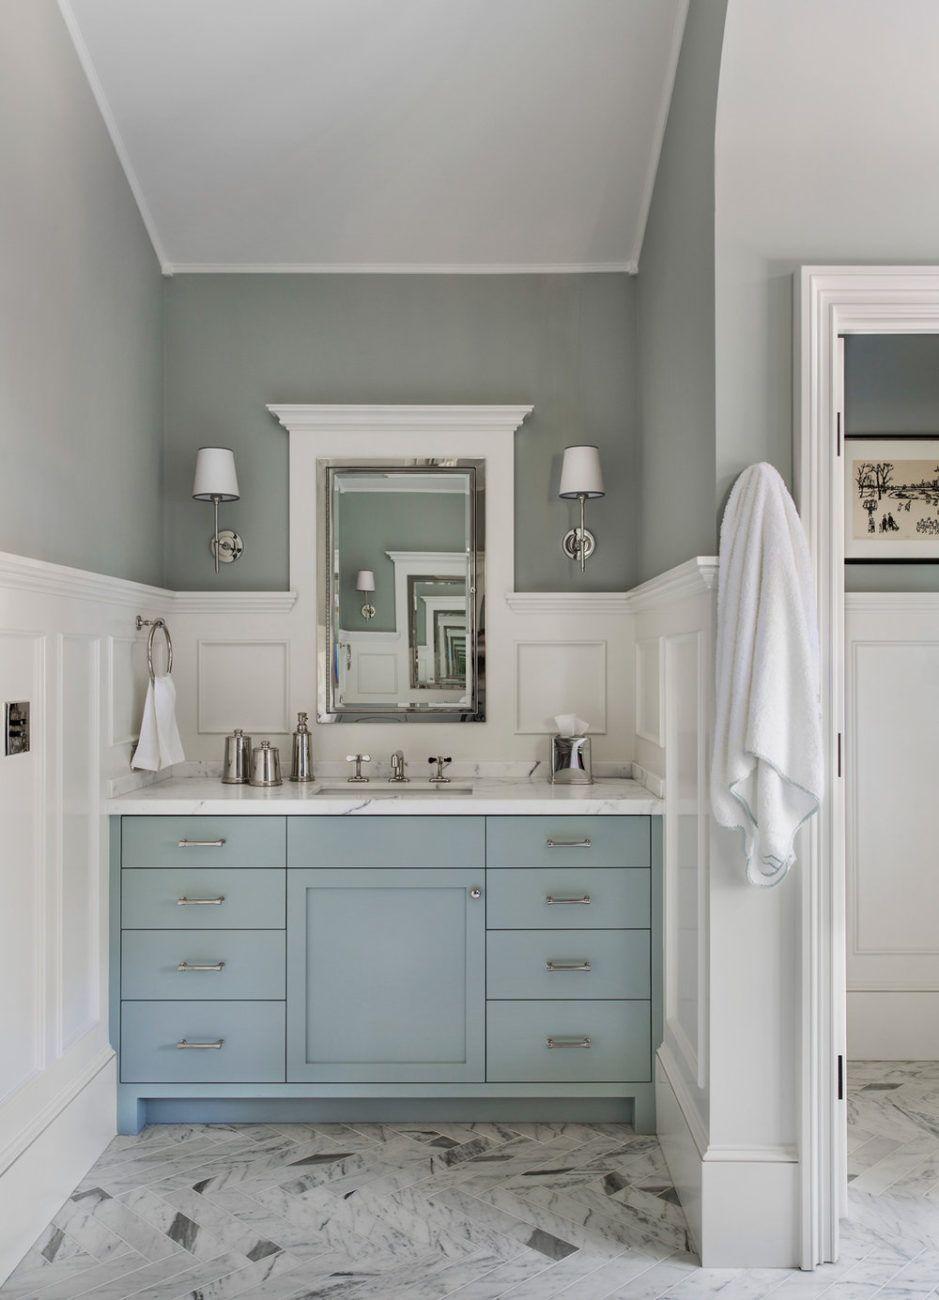 Tim Barber Ltd Small Bathroom Vanities Blue Bathroom Vanity Bathroom Vanity